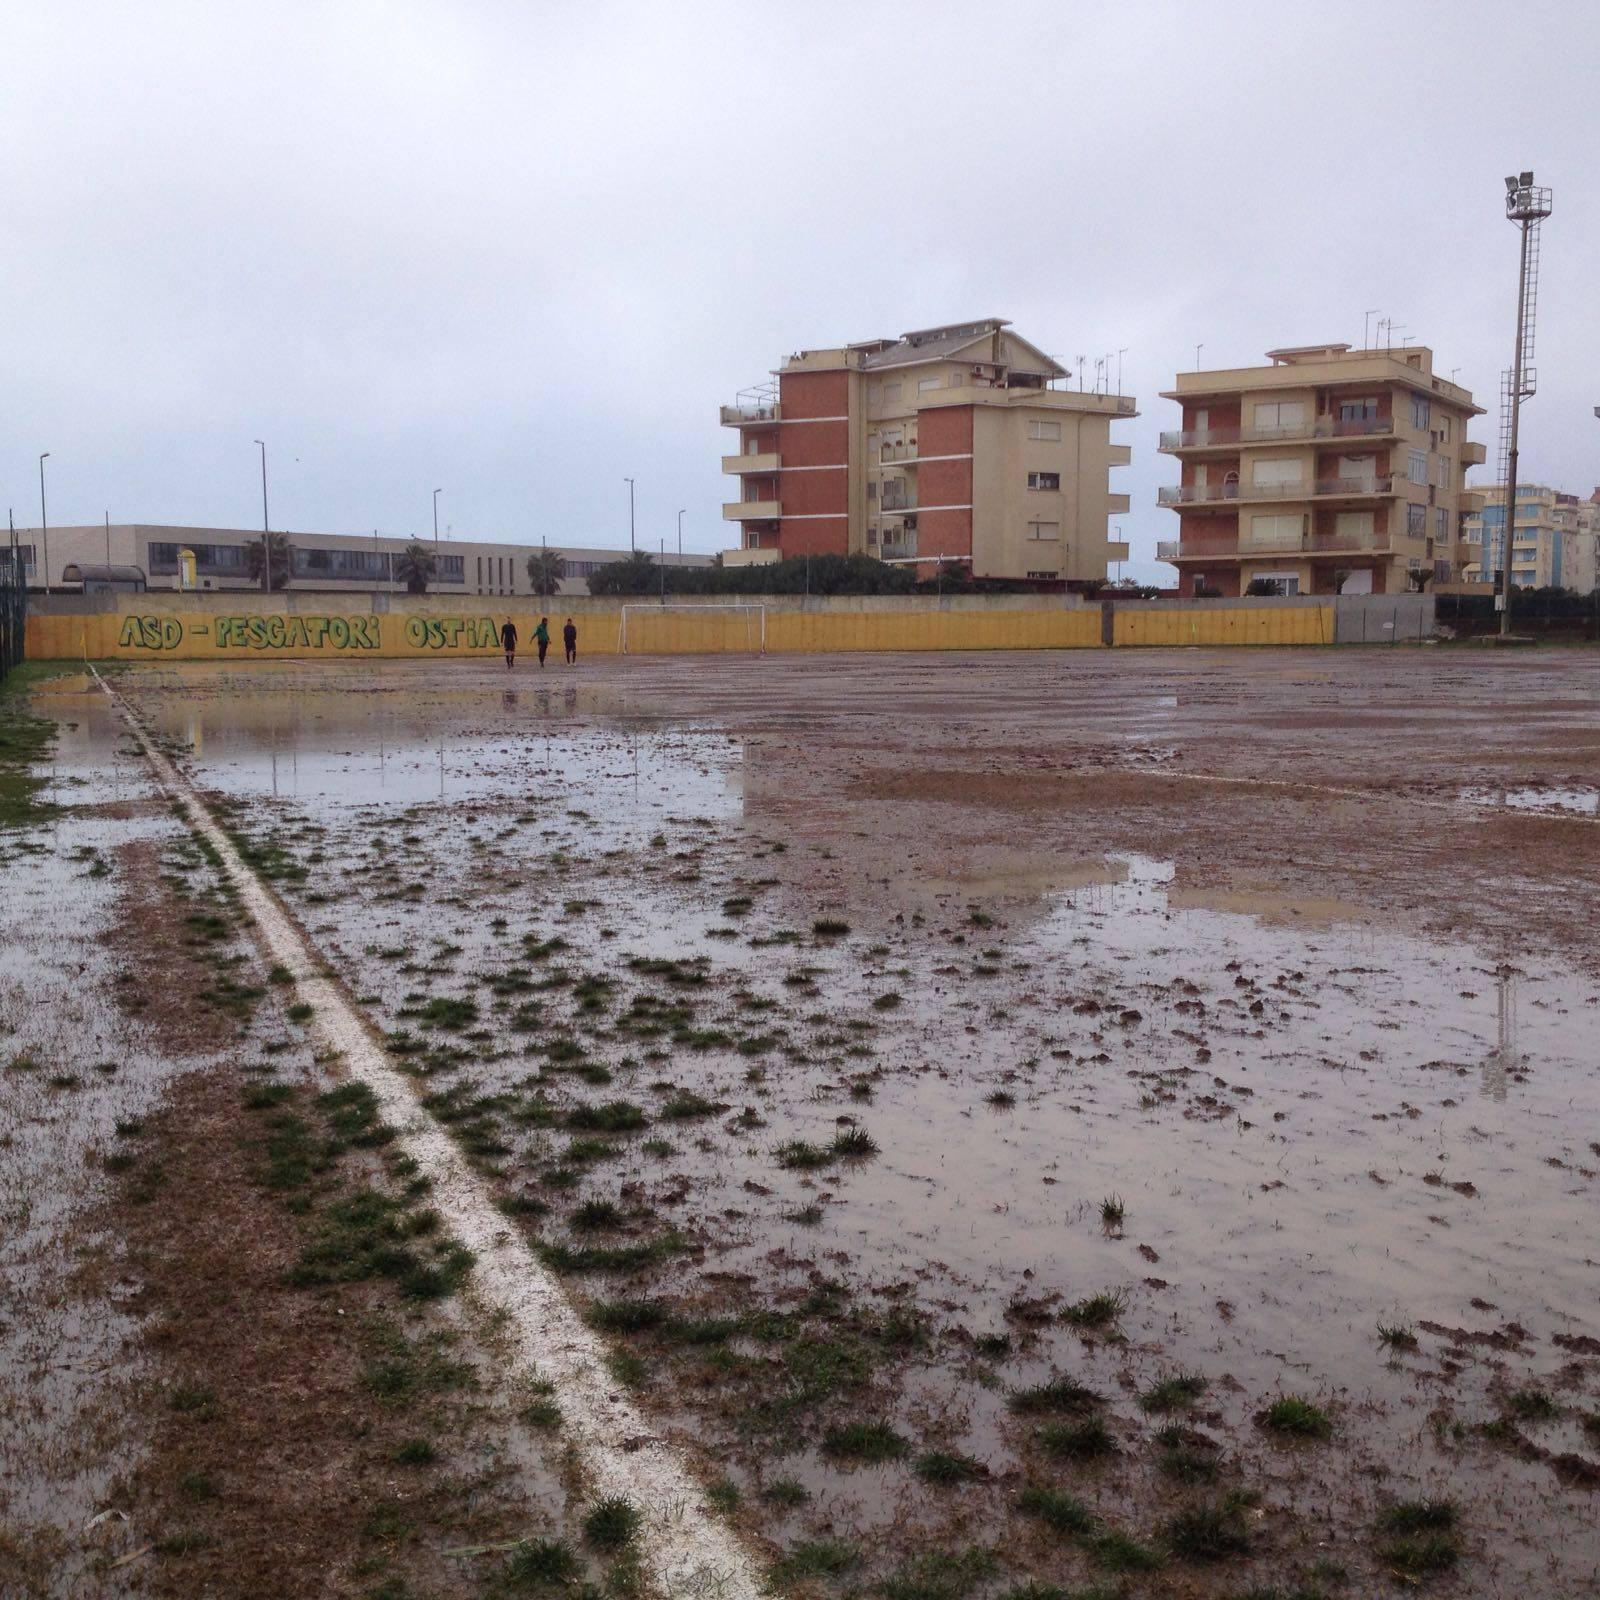 Pescatori Ostia – Santa Marinella rinviata per impraticabilità